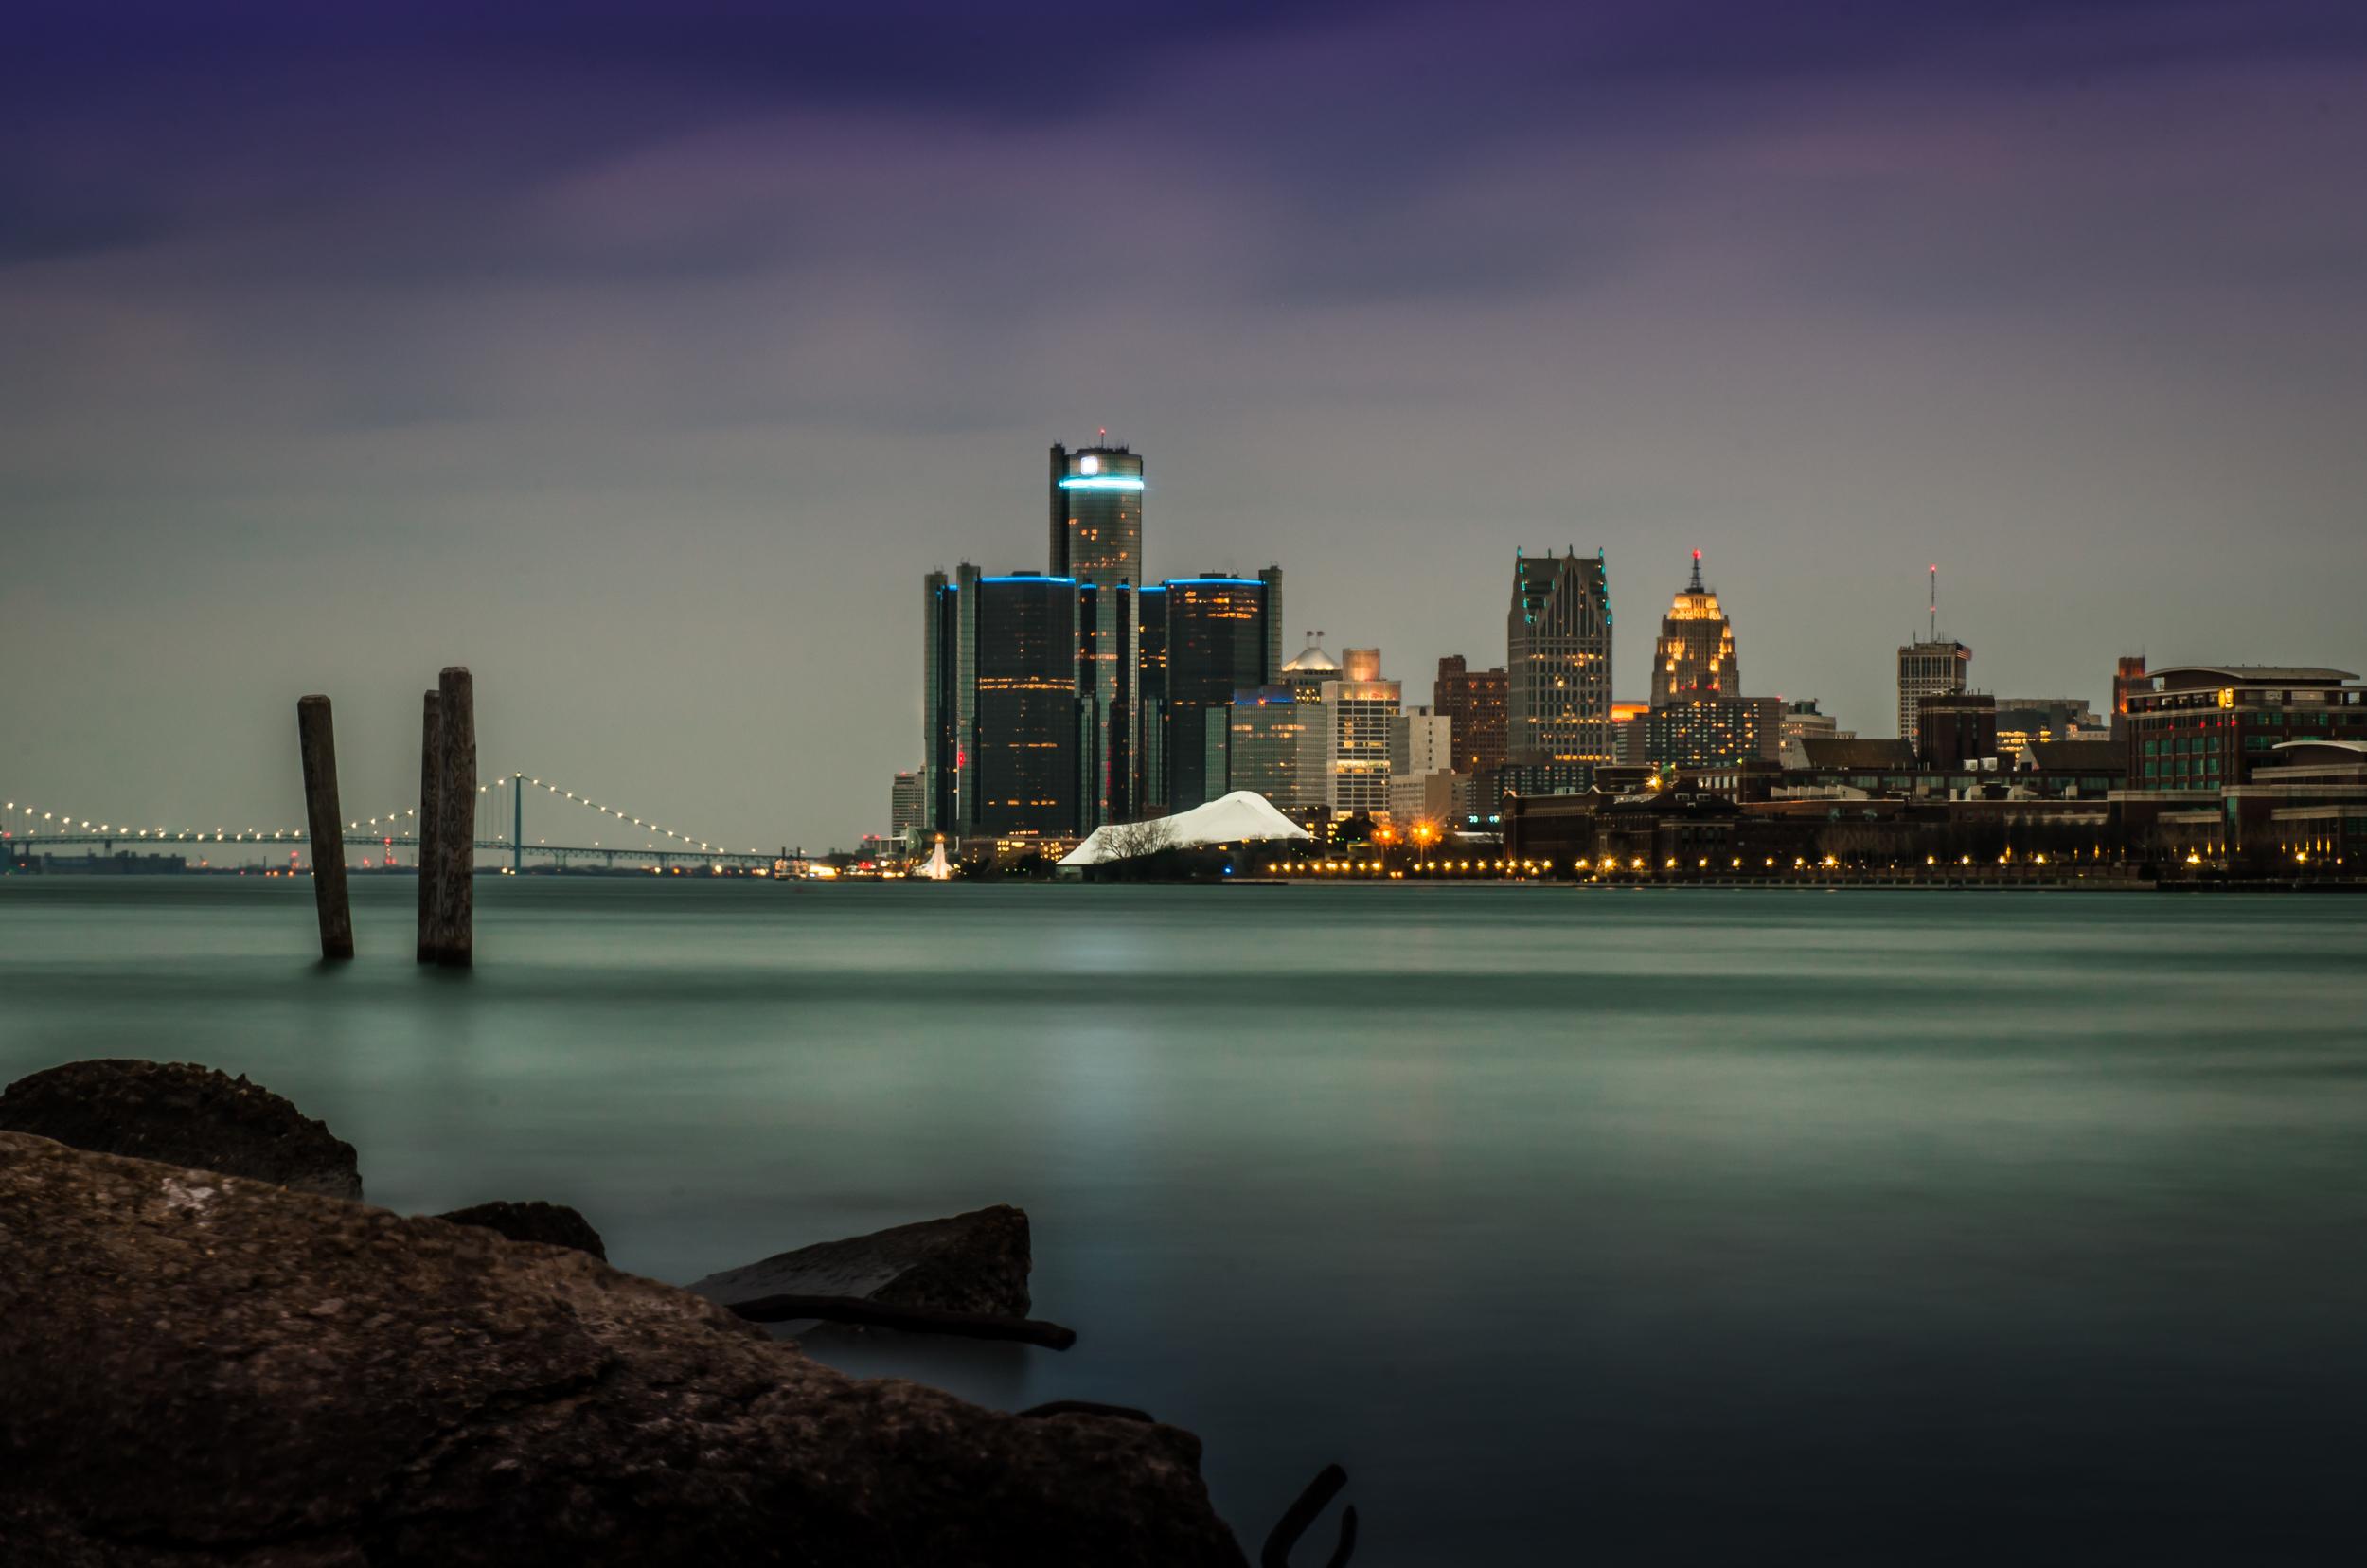 Detroit Skyline from Belle Isle